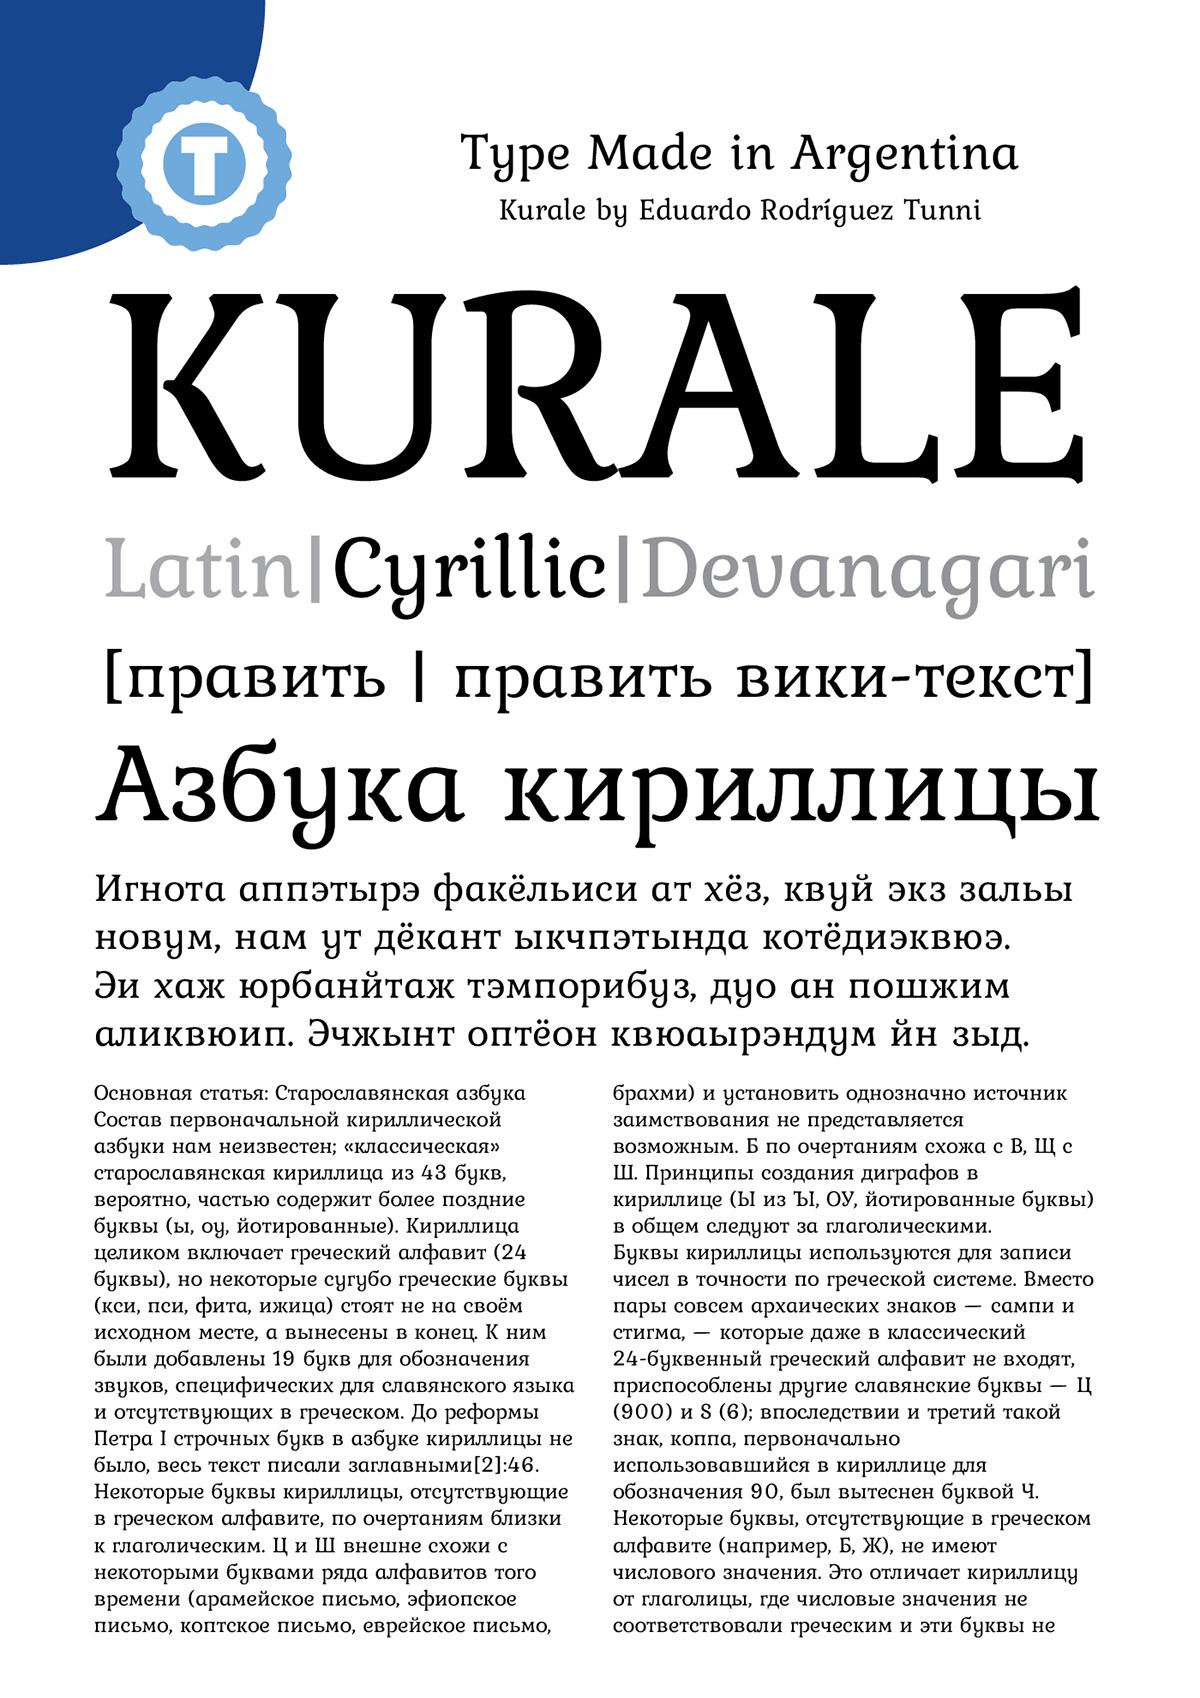 Kurale бесплатный кириллический шрифт от Eduardo Tunni